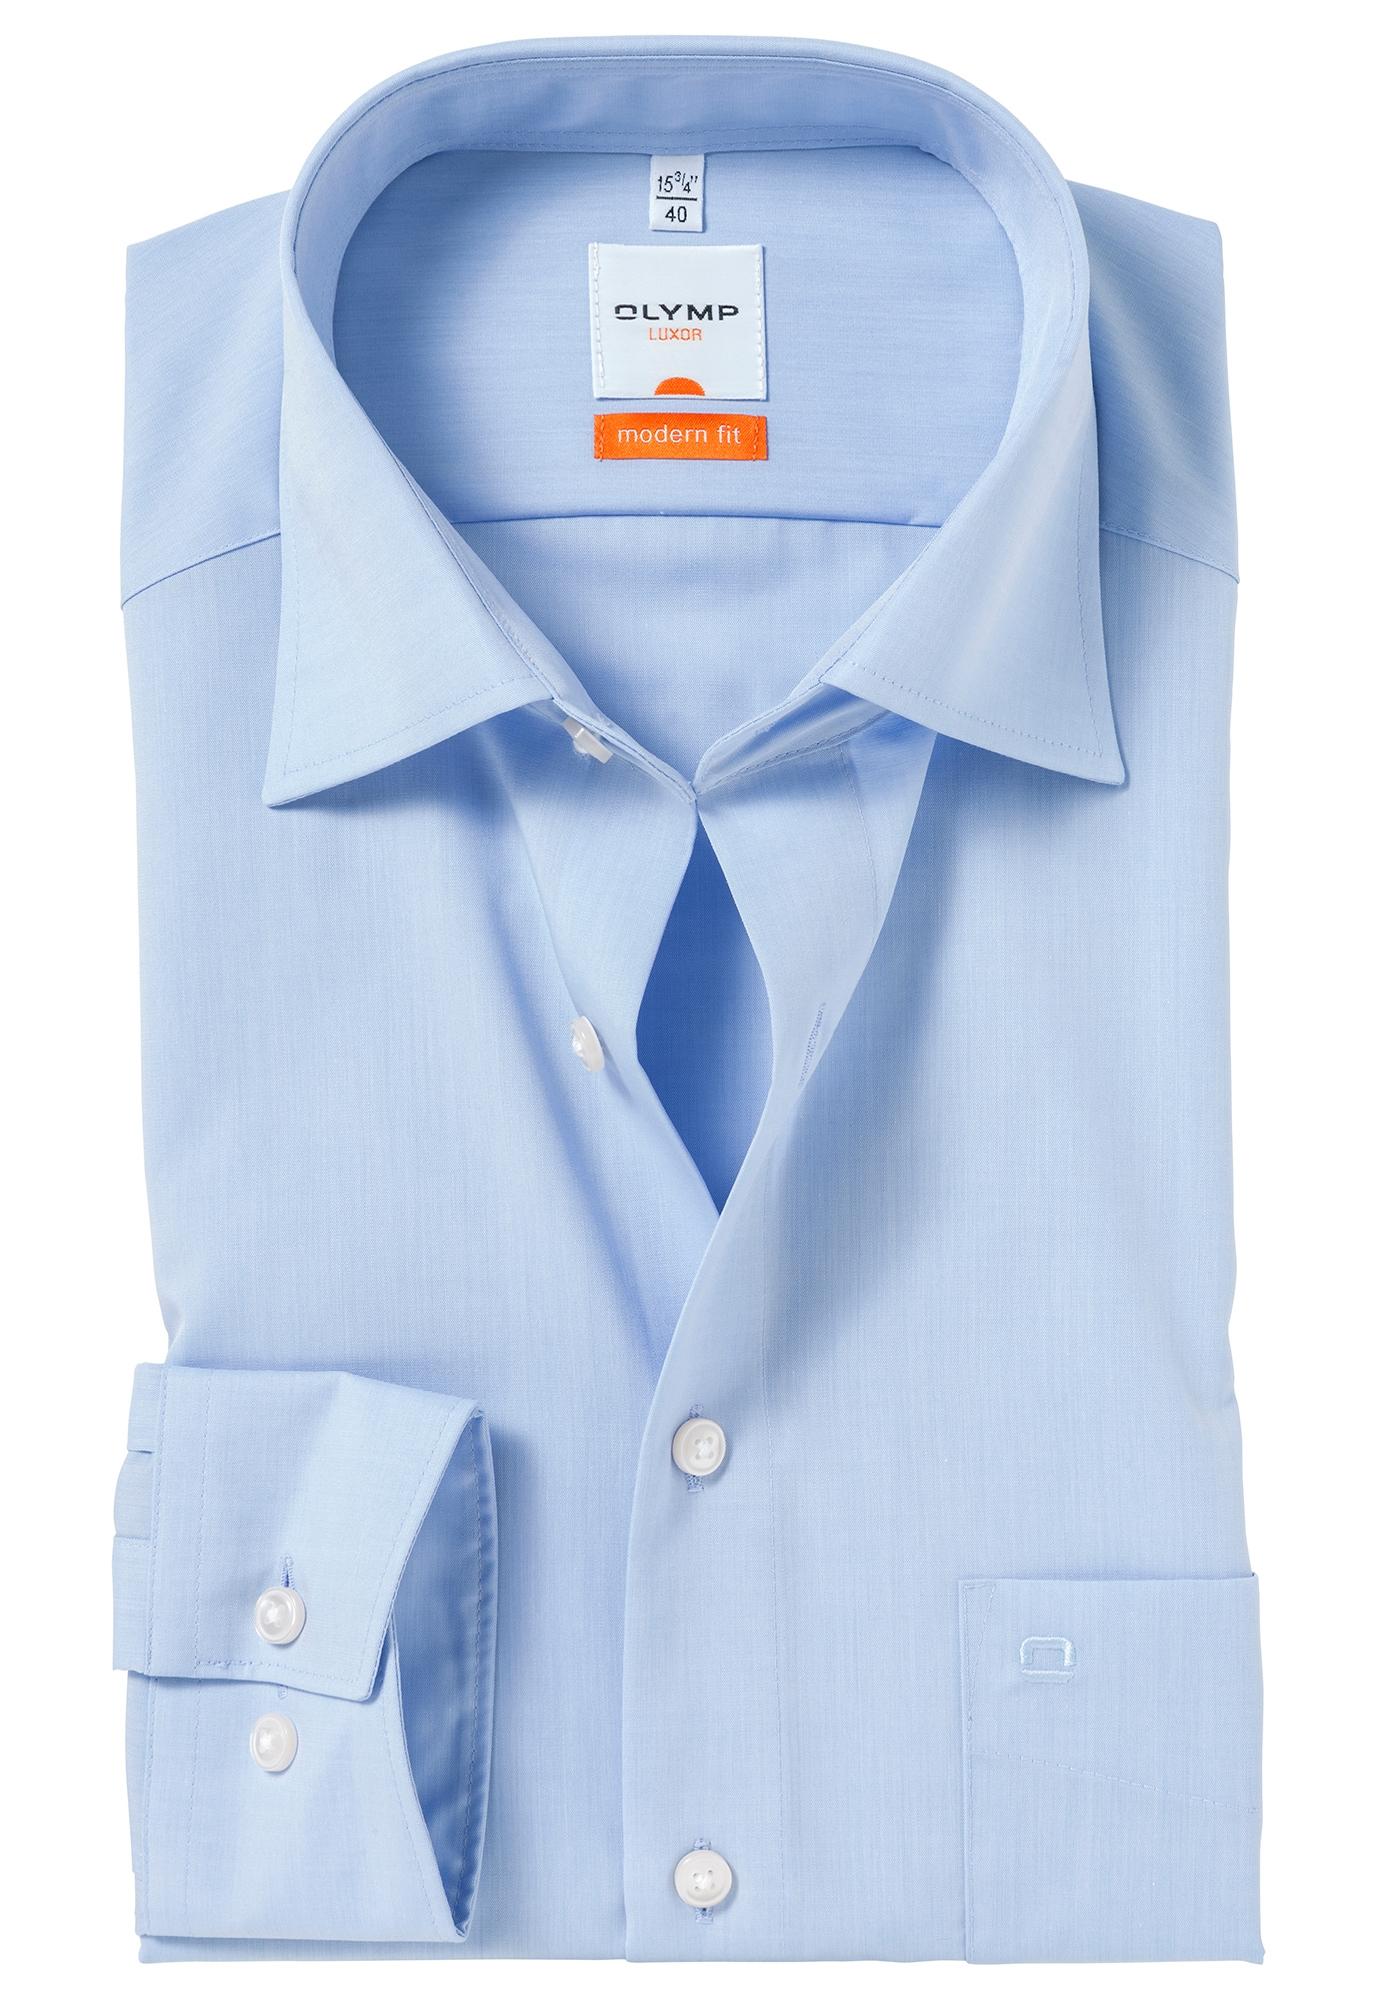 olymp modern fit overhemd mouwlengte 7 licht blauw gratis bezorgd. Black Bedroom Furniture Sets. Home Design Ideas